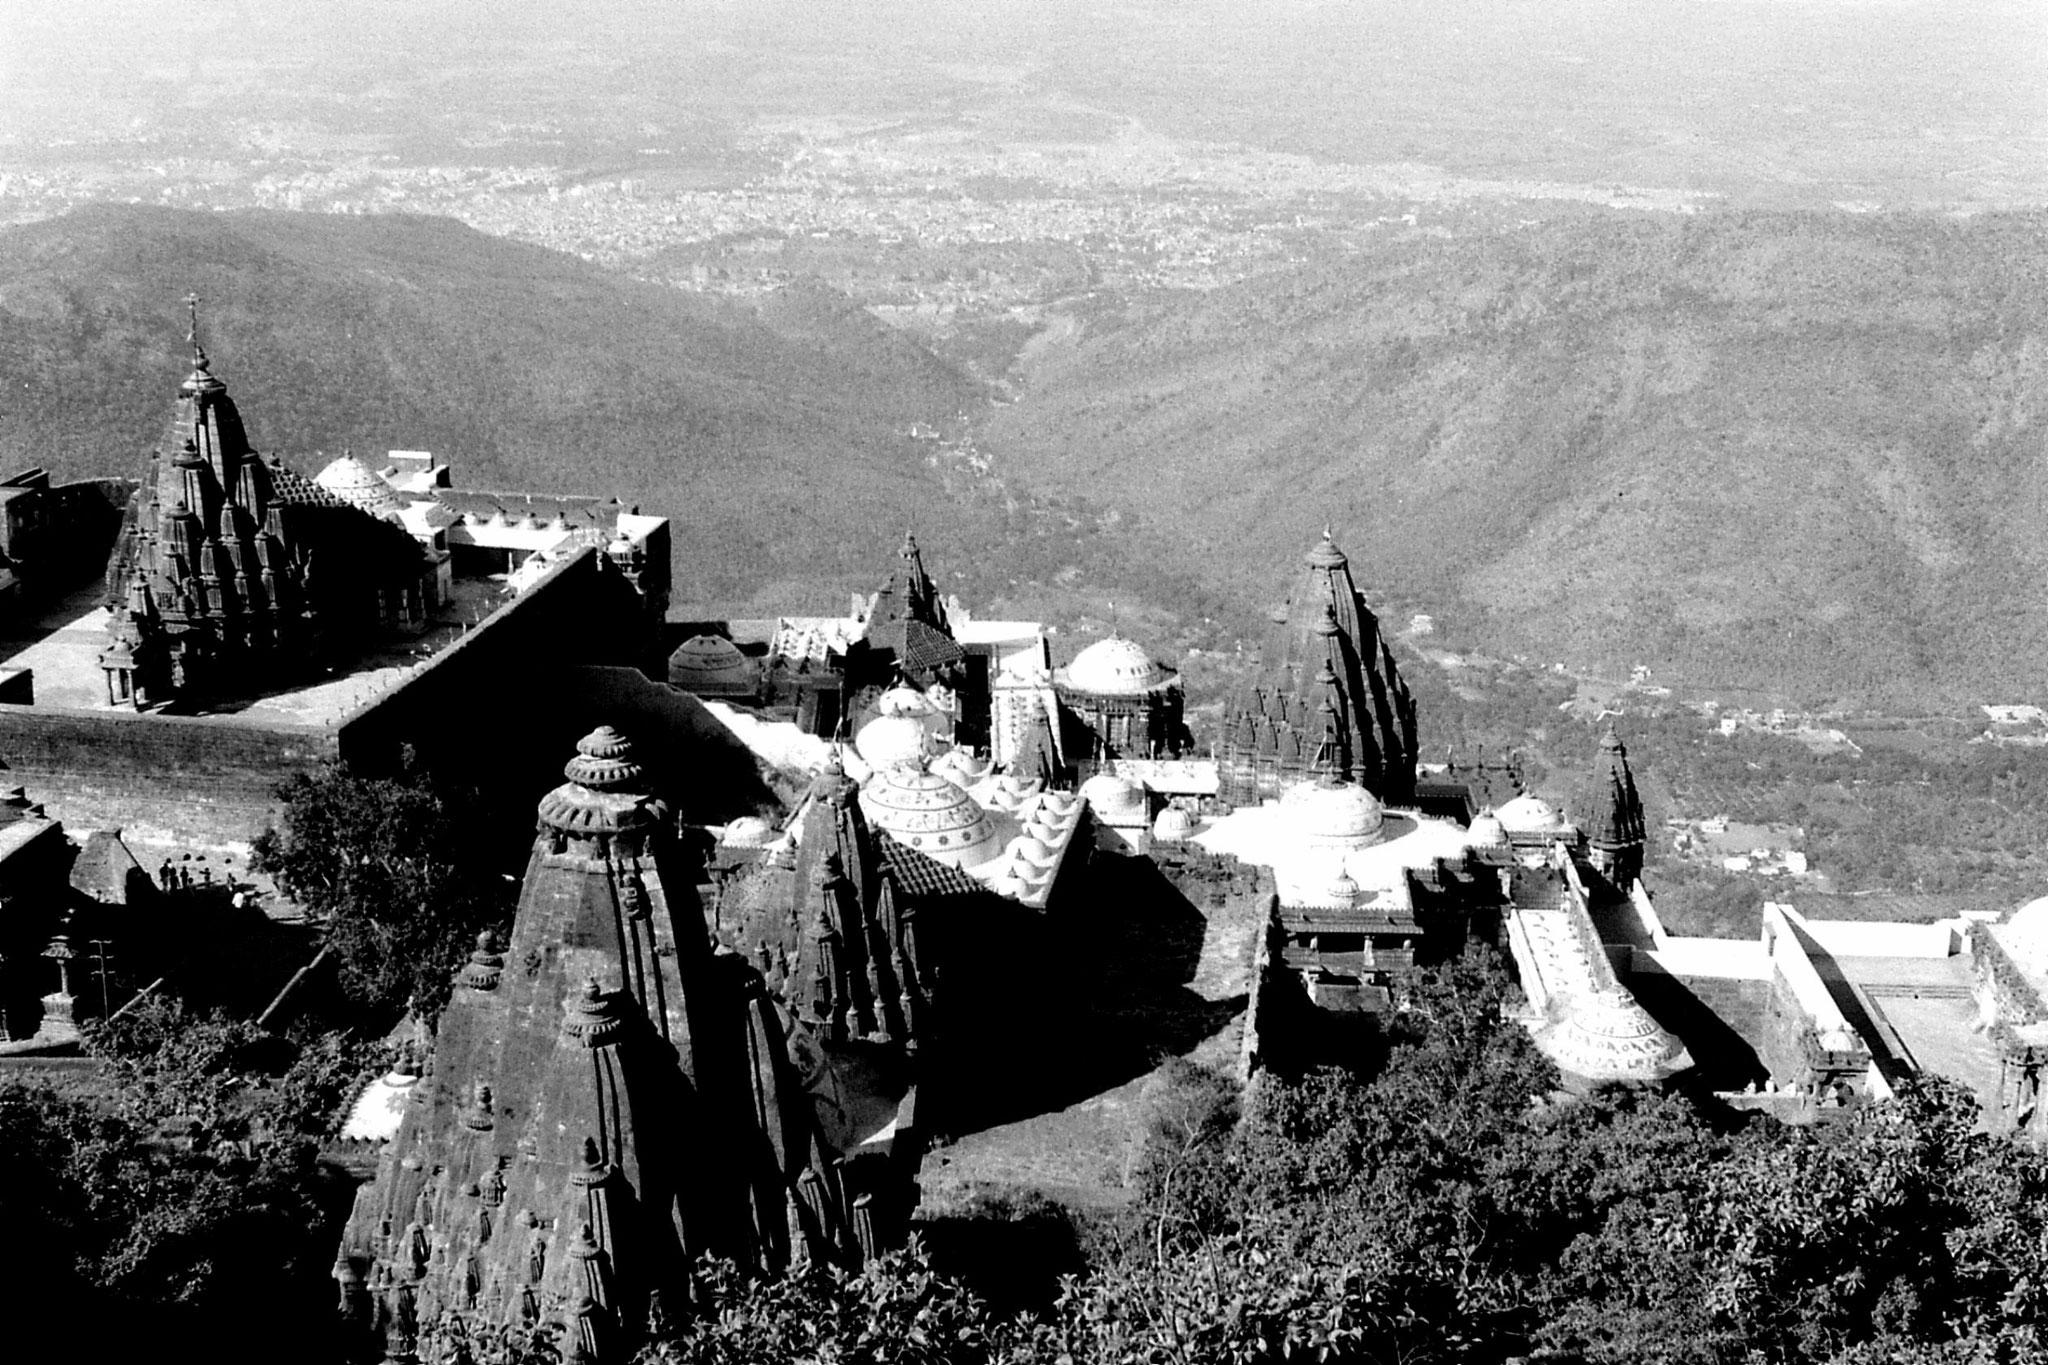 12/12/1989: 27: Junagardh, temples under Mt Girnar